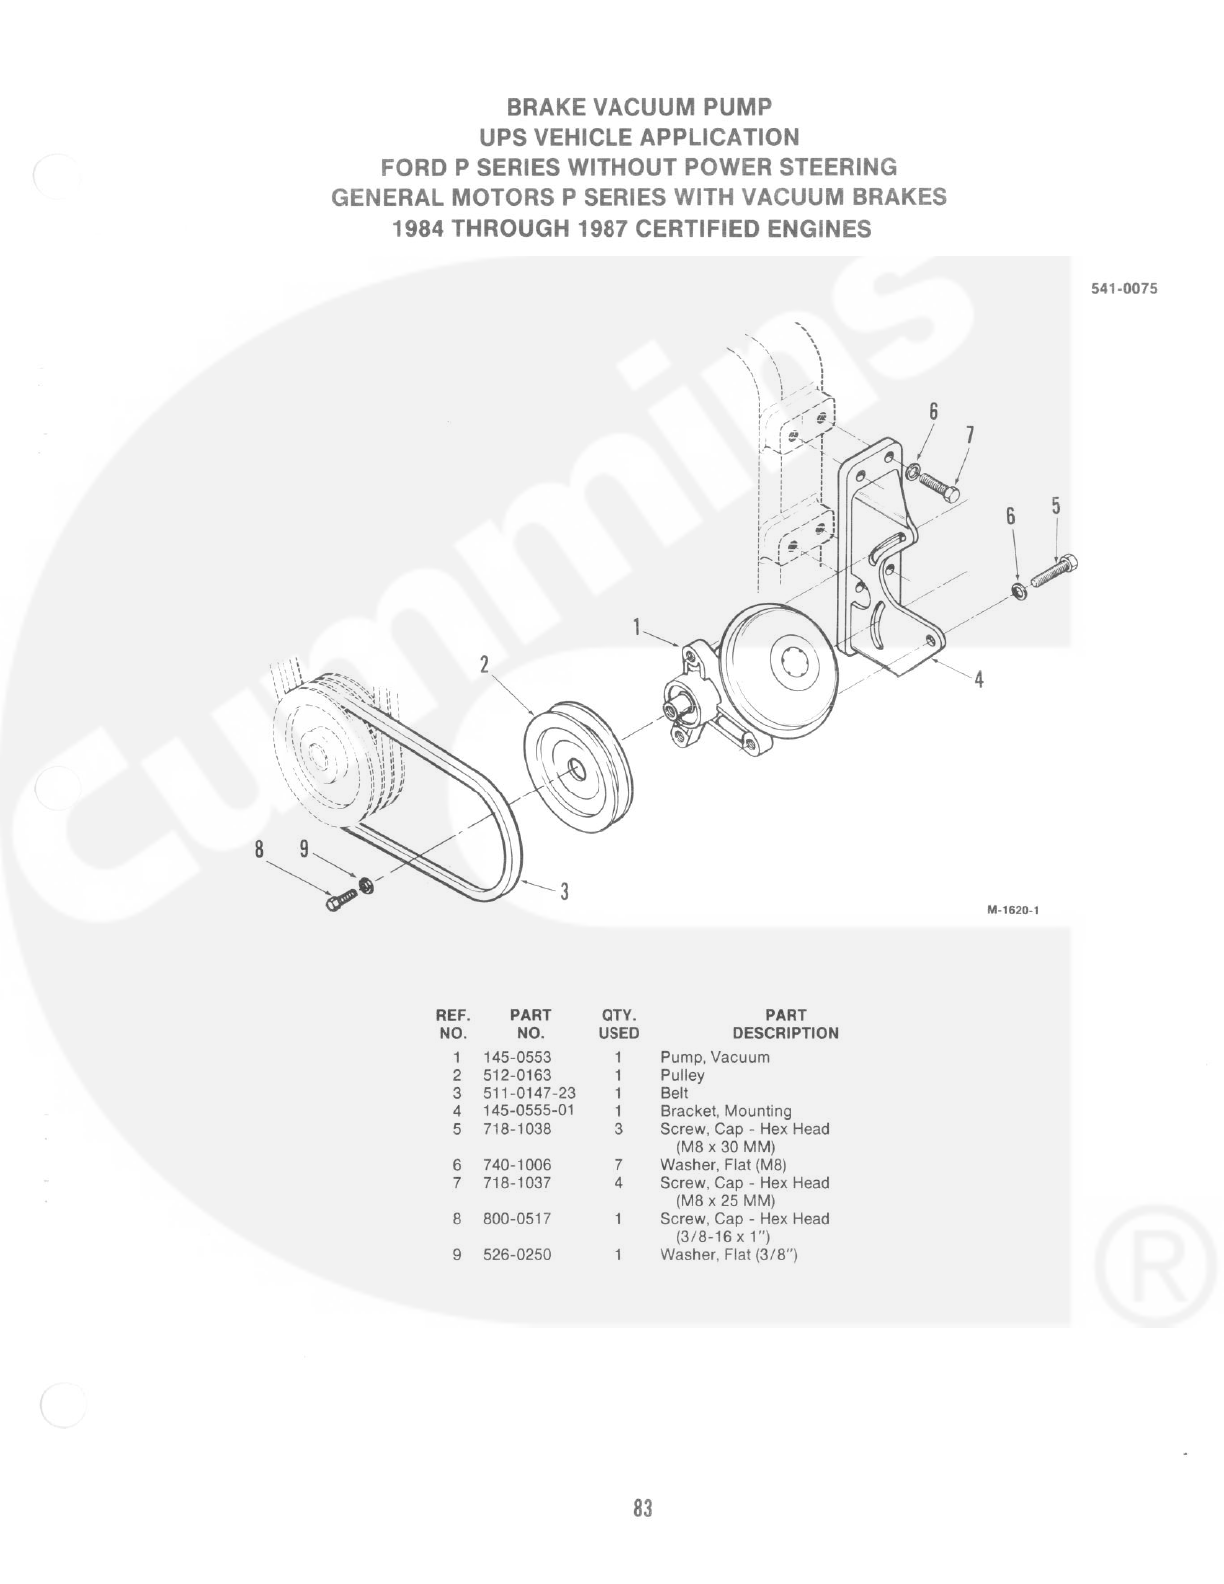 Scanned 934 0255 Onan L634t A Diesel Engine Parts Manual 09 2013 3 8 Chrysler Motor Mount Diagram Cummins Power Generation